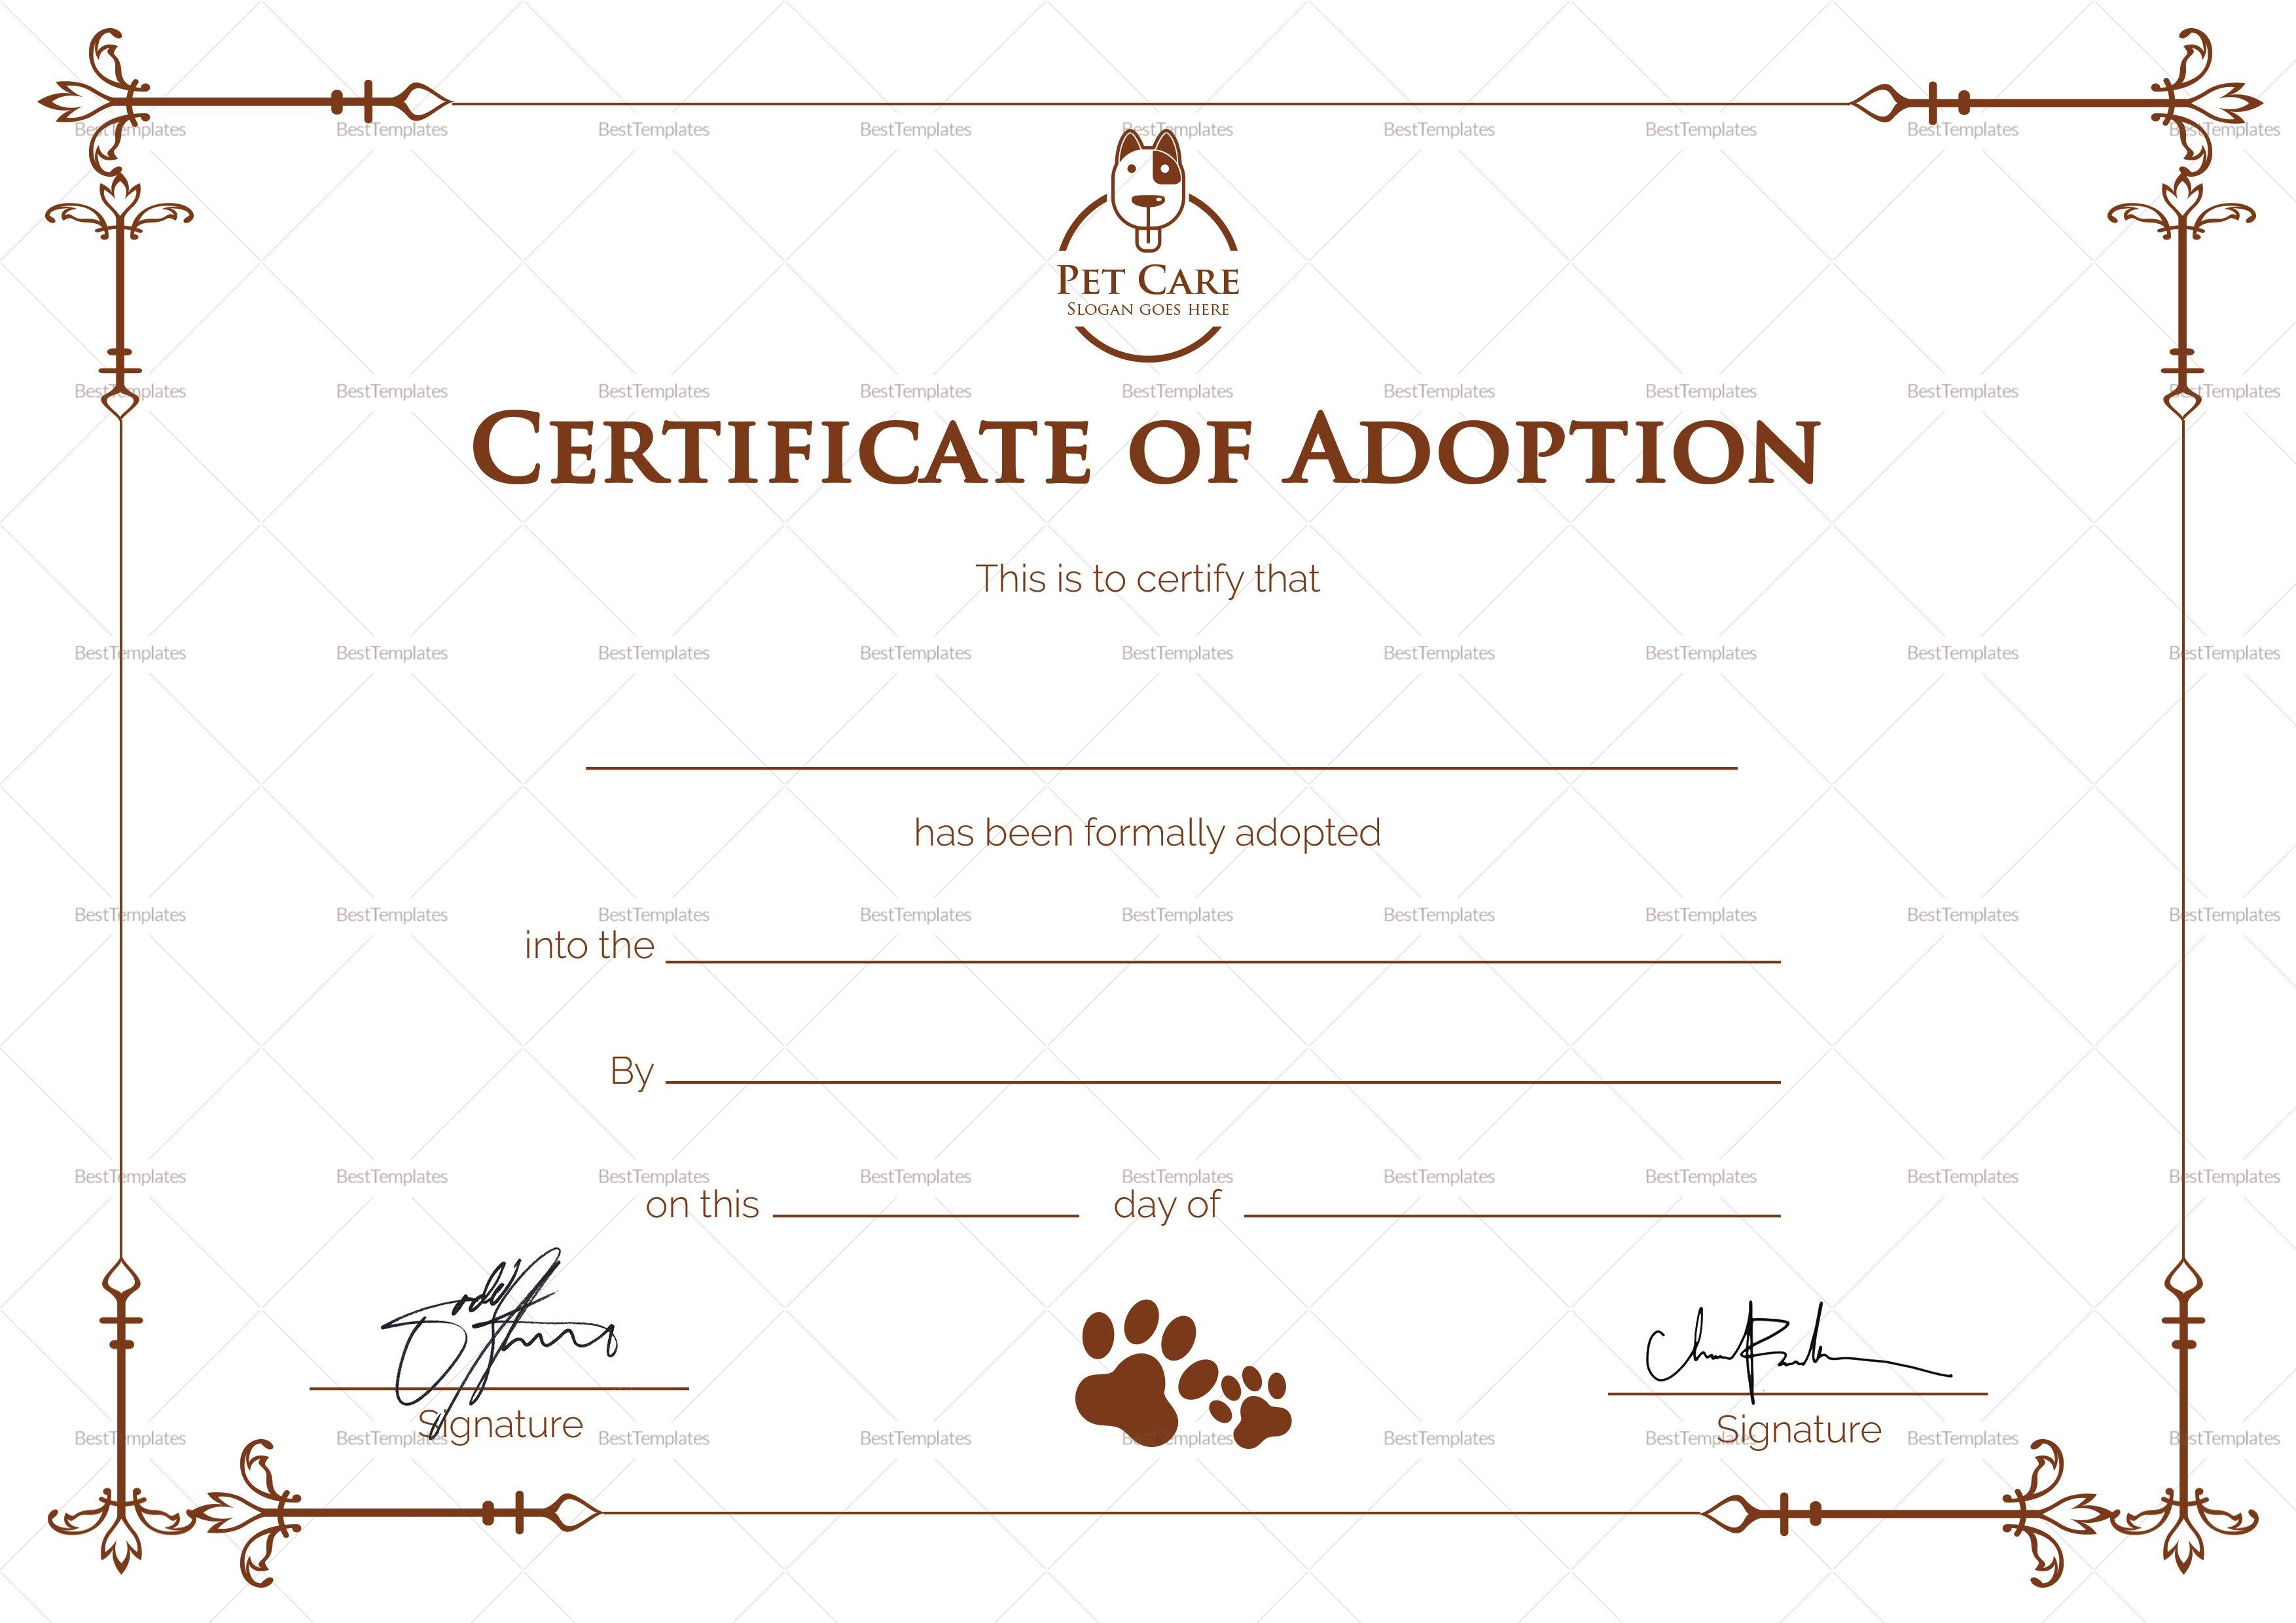 Simple Adoption Certificate Design Template In Psd Word Pertaining To Adoption Certificate Template